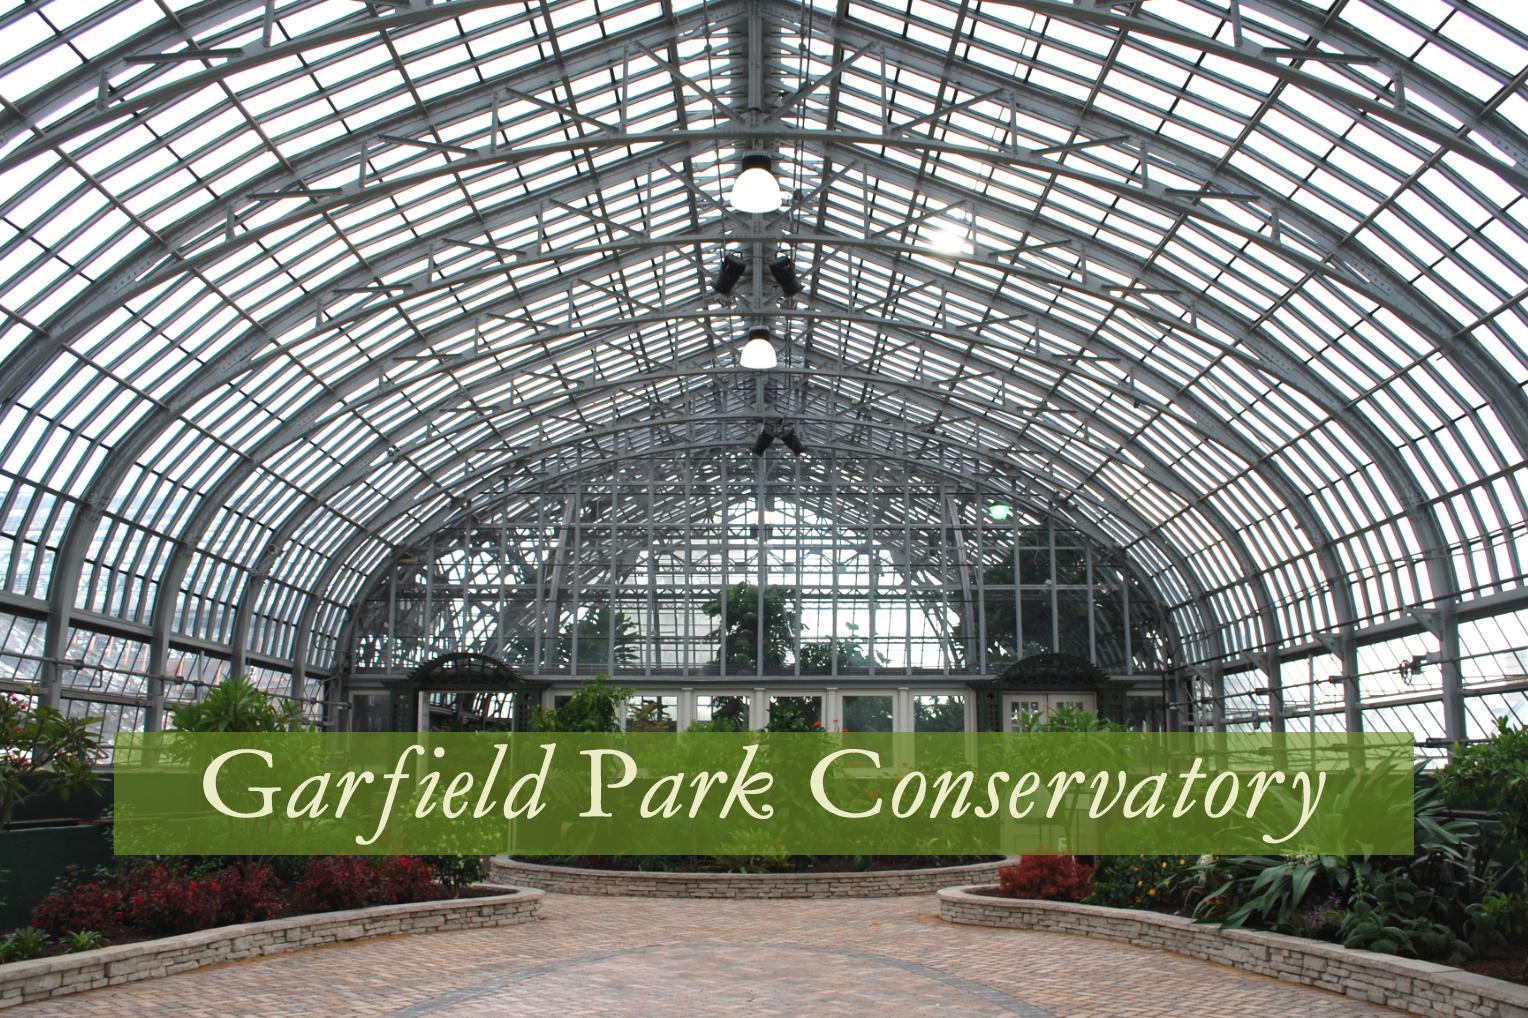 Garfield Park Conservatory.jpg